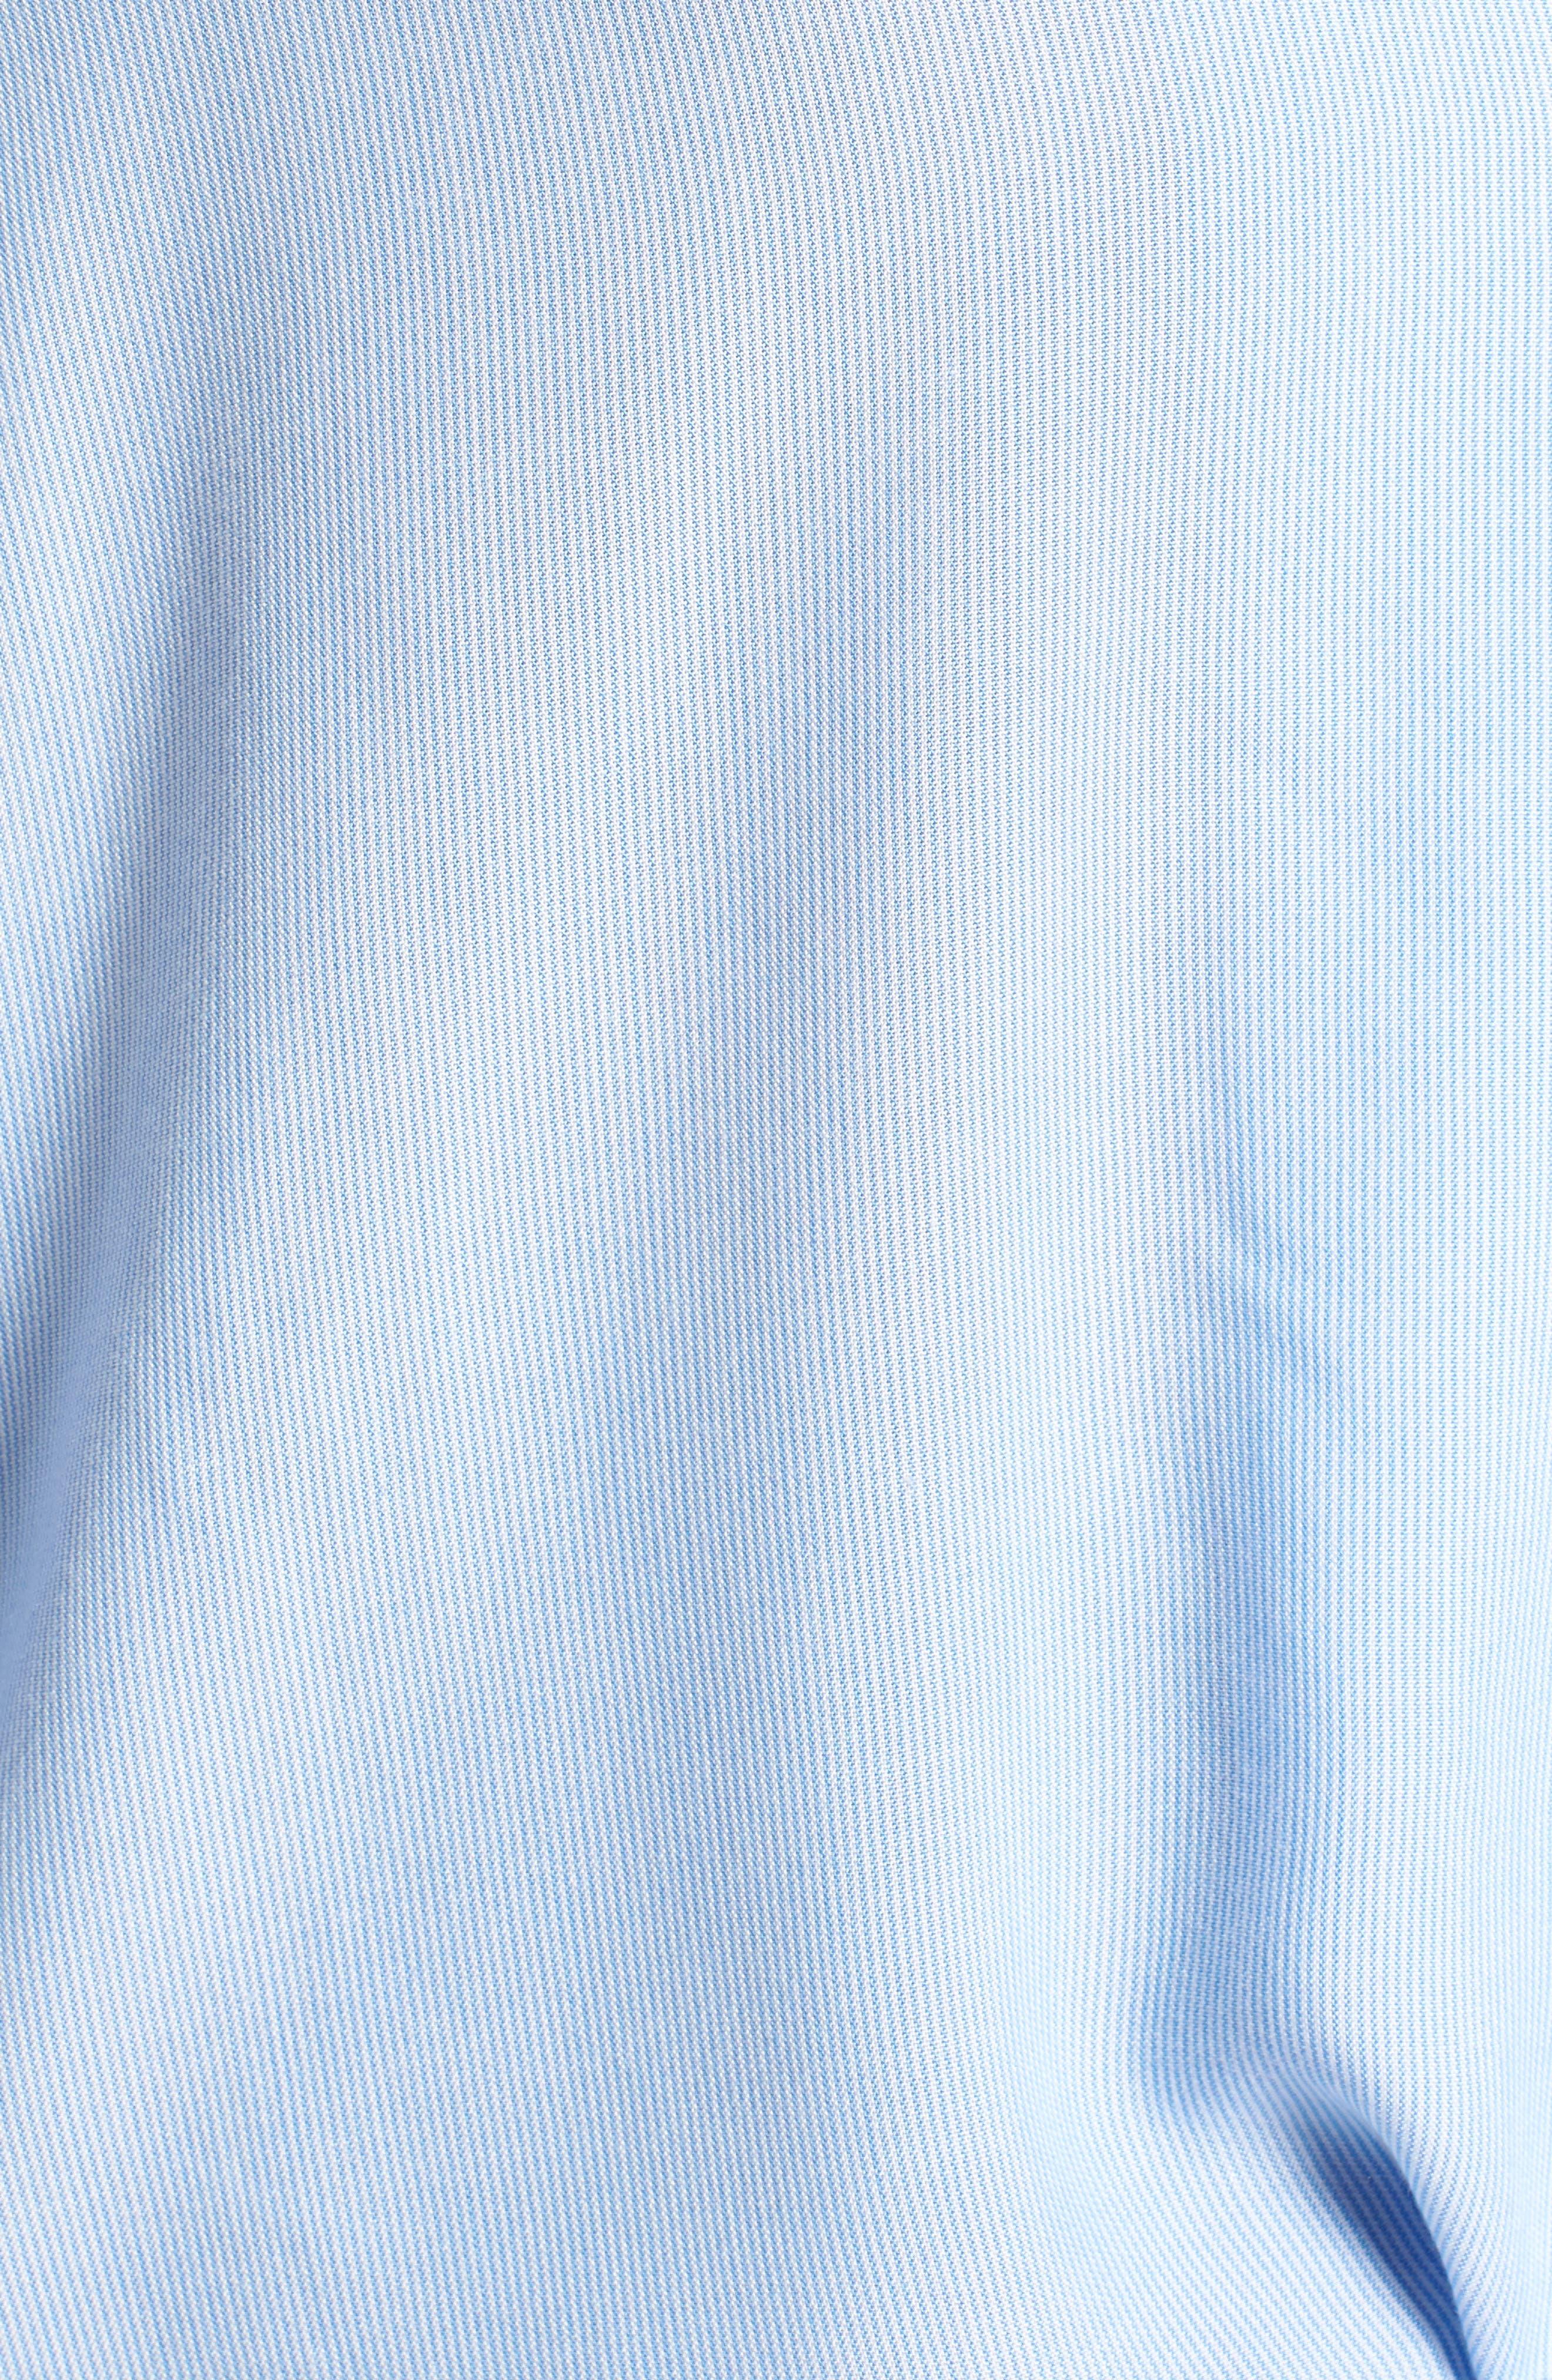 Tie Front Shirt,                             Alternate thumbnail 6, color,                             Blue Lake Micro Stripe